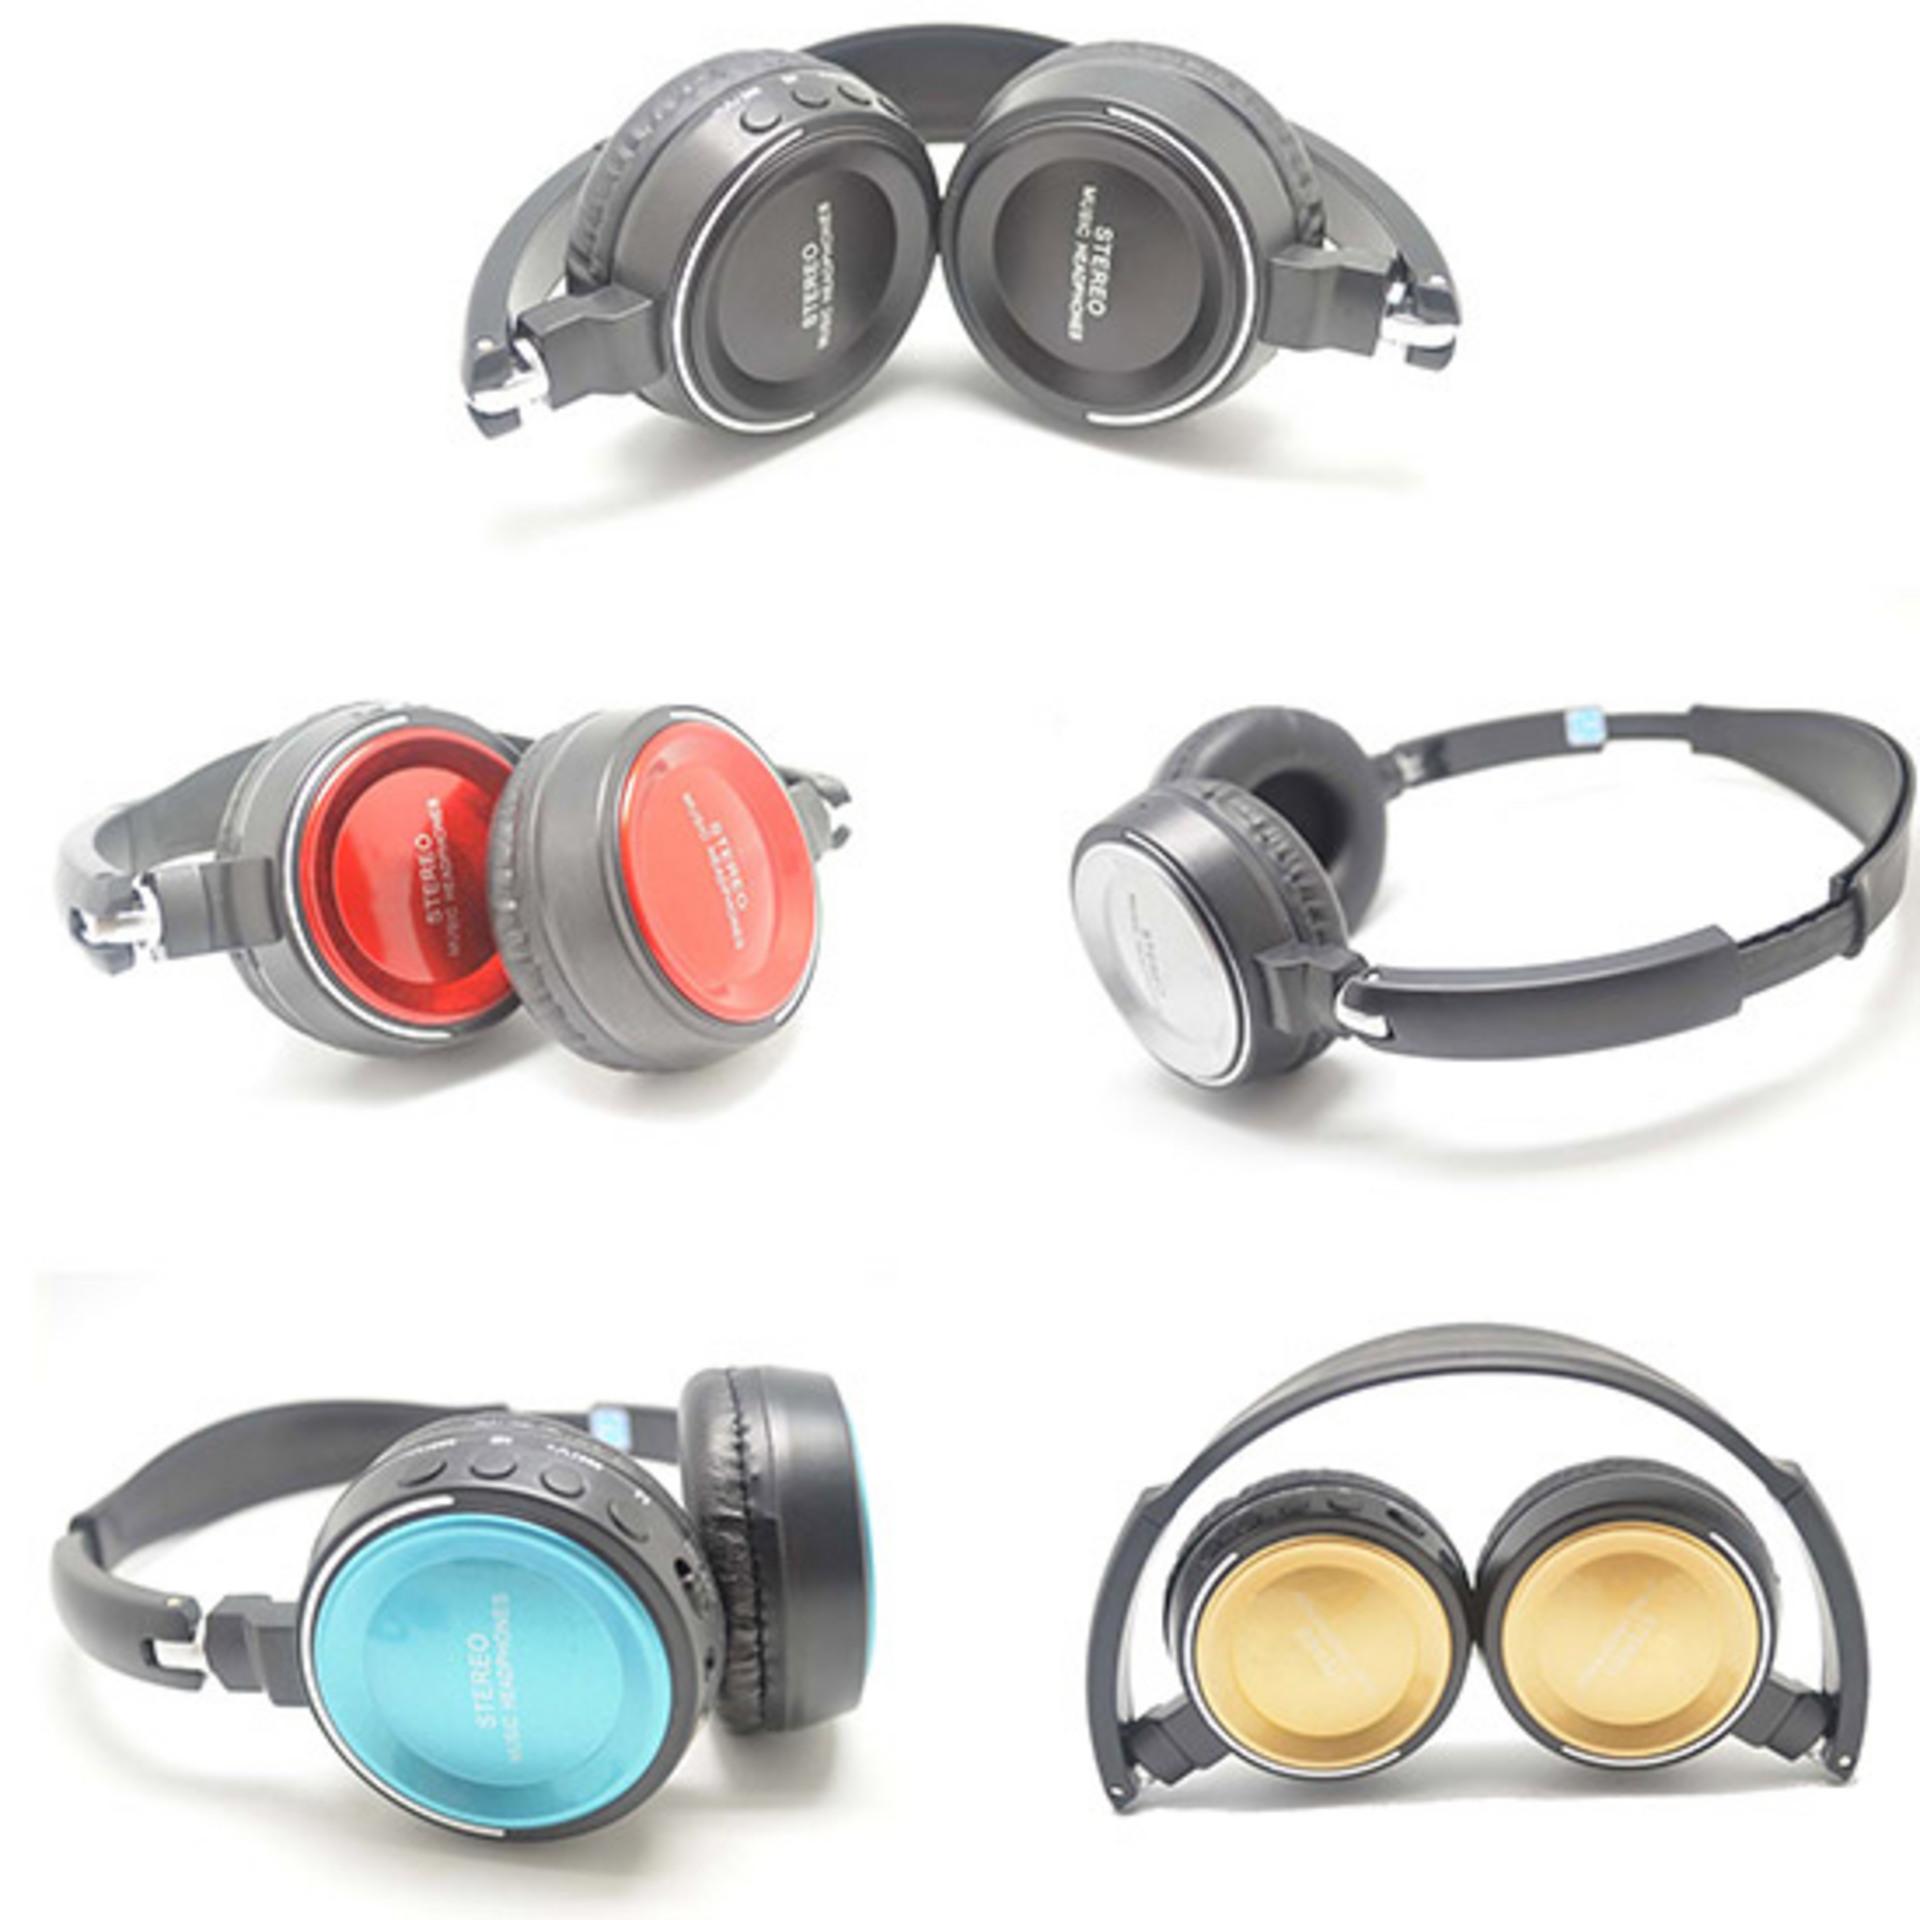 Cuffie stereo Bluetooth con microfono - Shoopi d18530c959f3